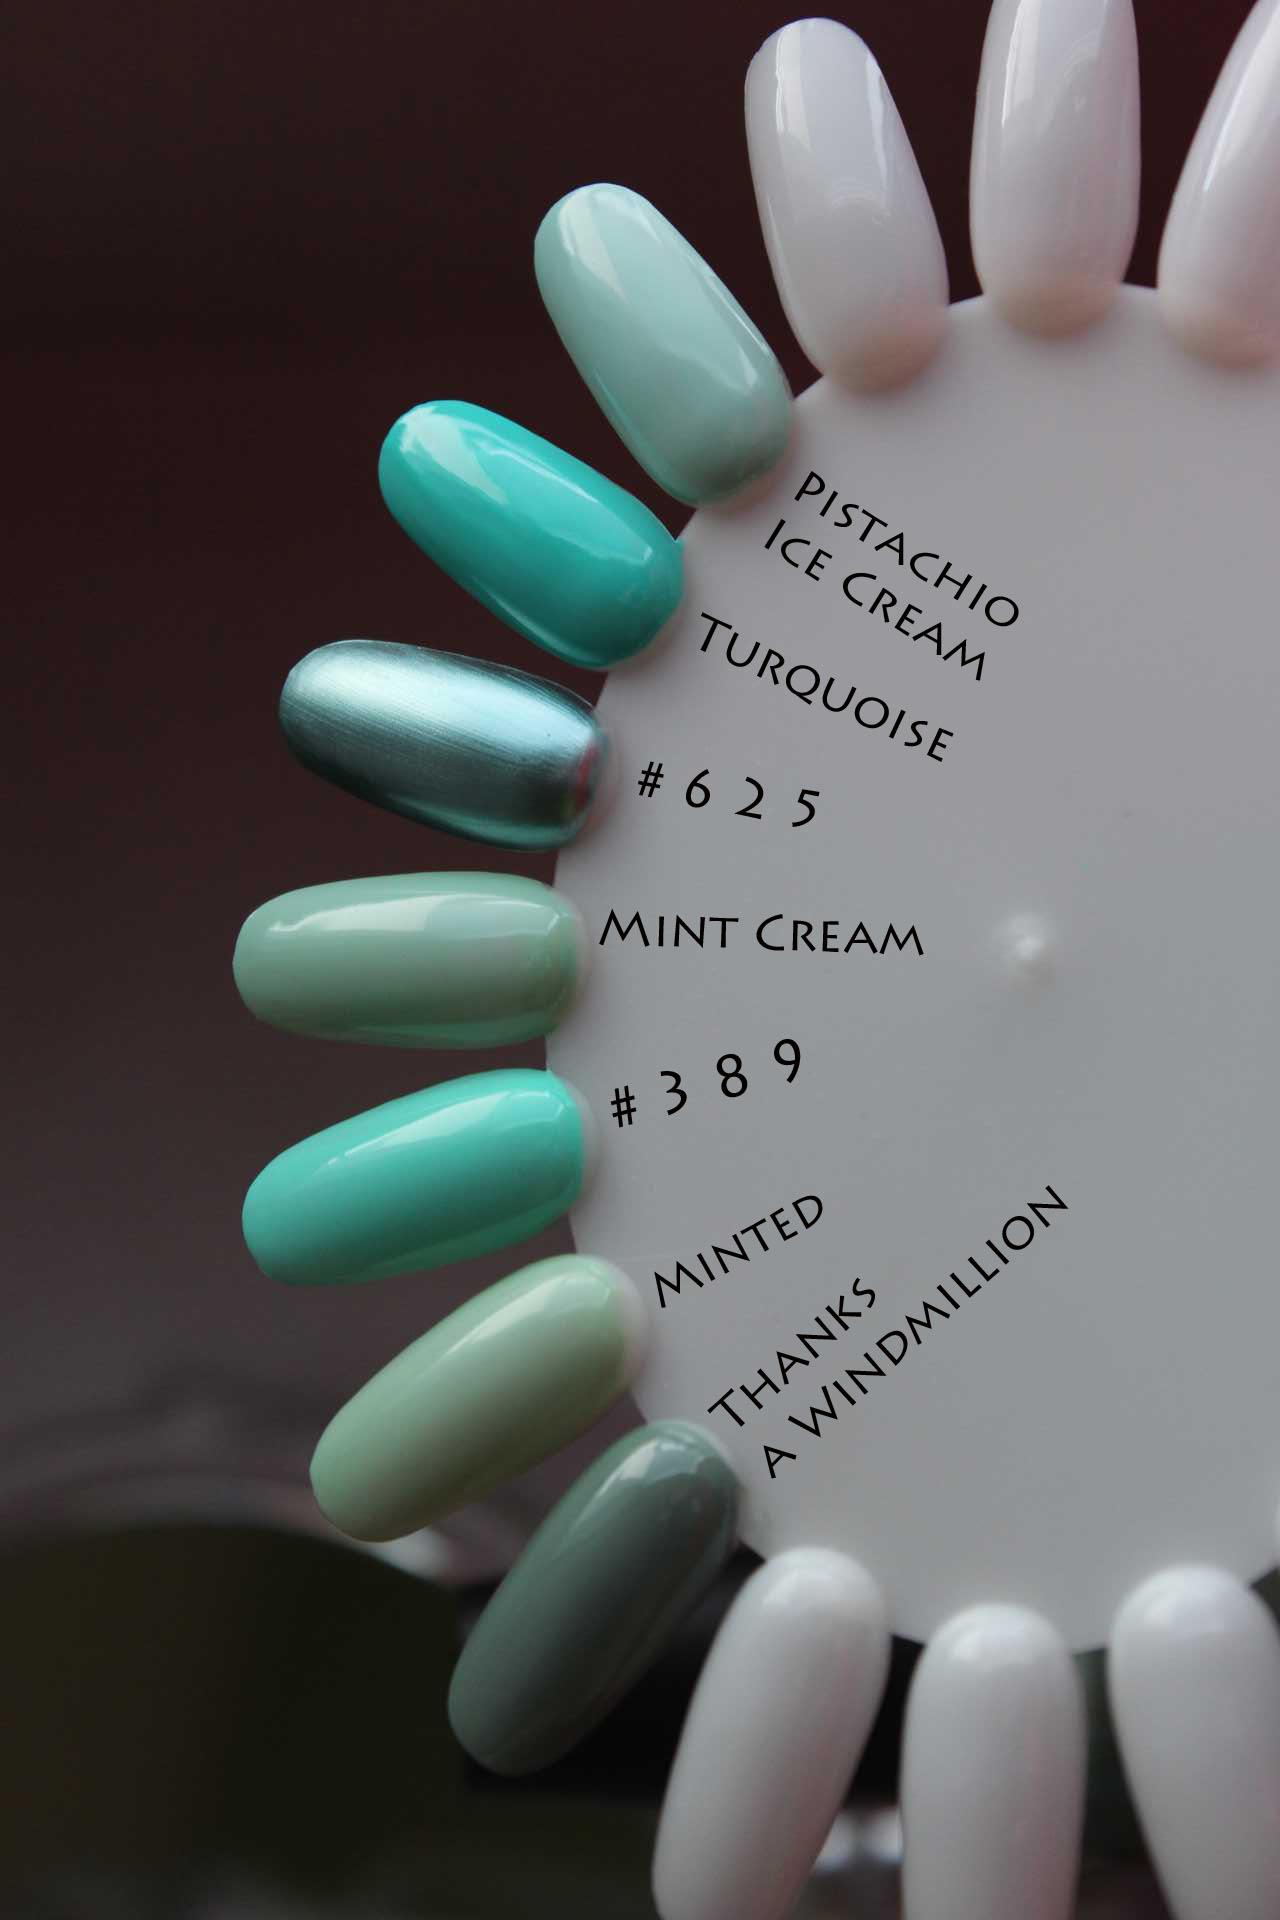 nunaavane-mint-polishes-nails-beauty-care-blogger-summer9 copie